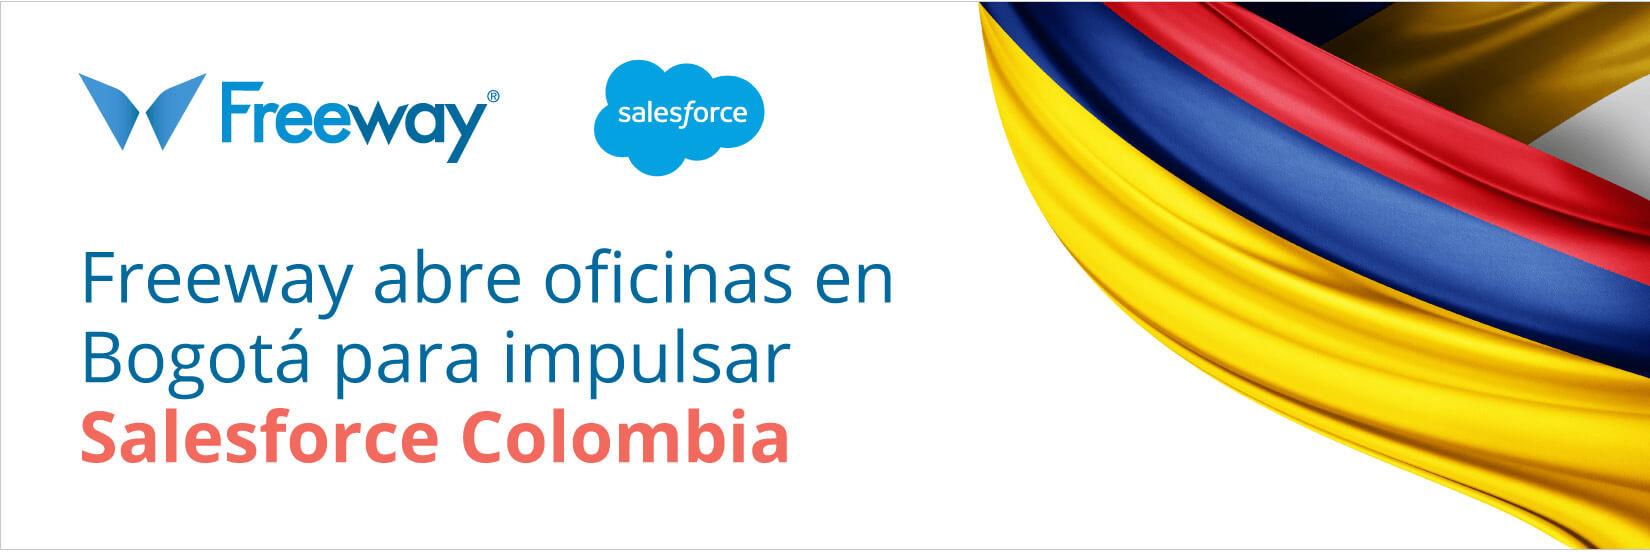 Saleforce Colombia